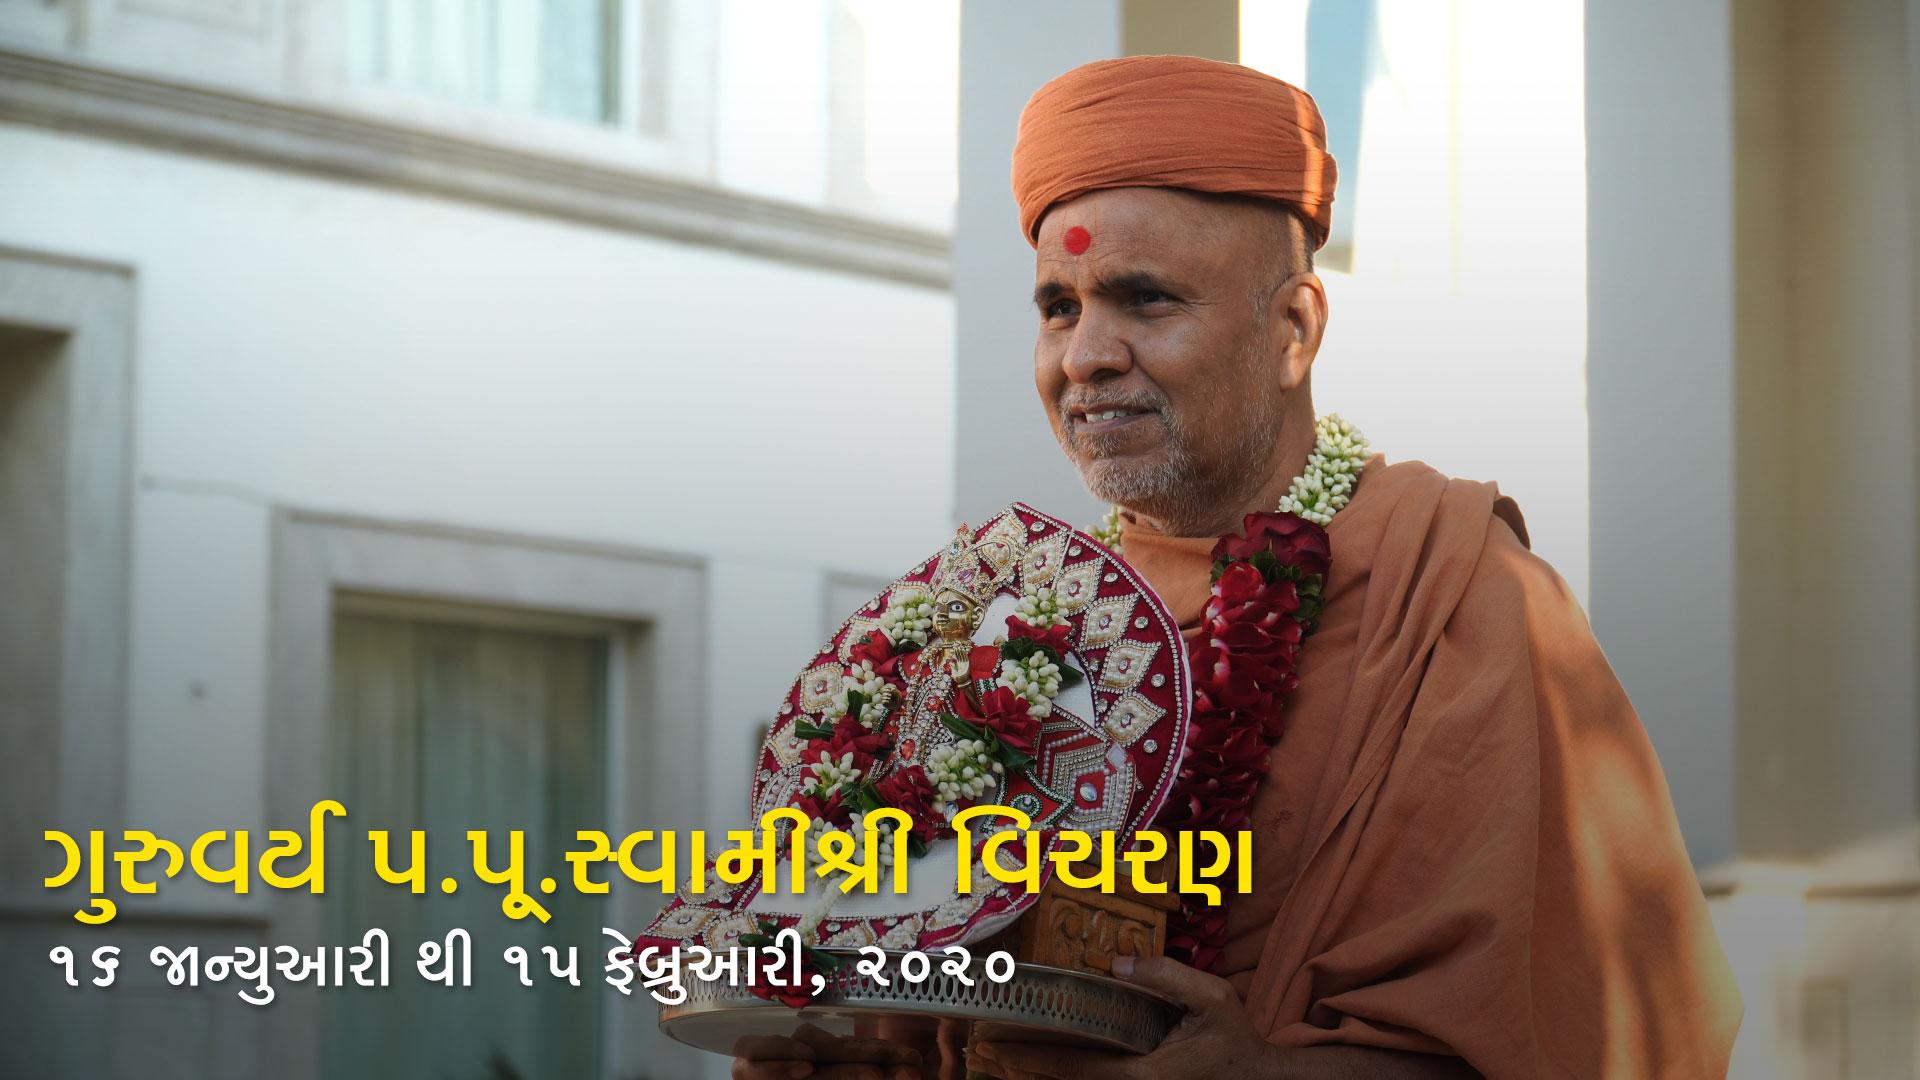 HDH Swamishri Vicharan | 16 Jan to 15 Feb, 2020